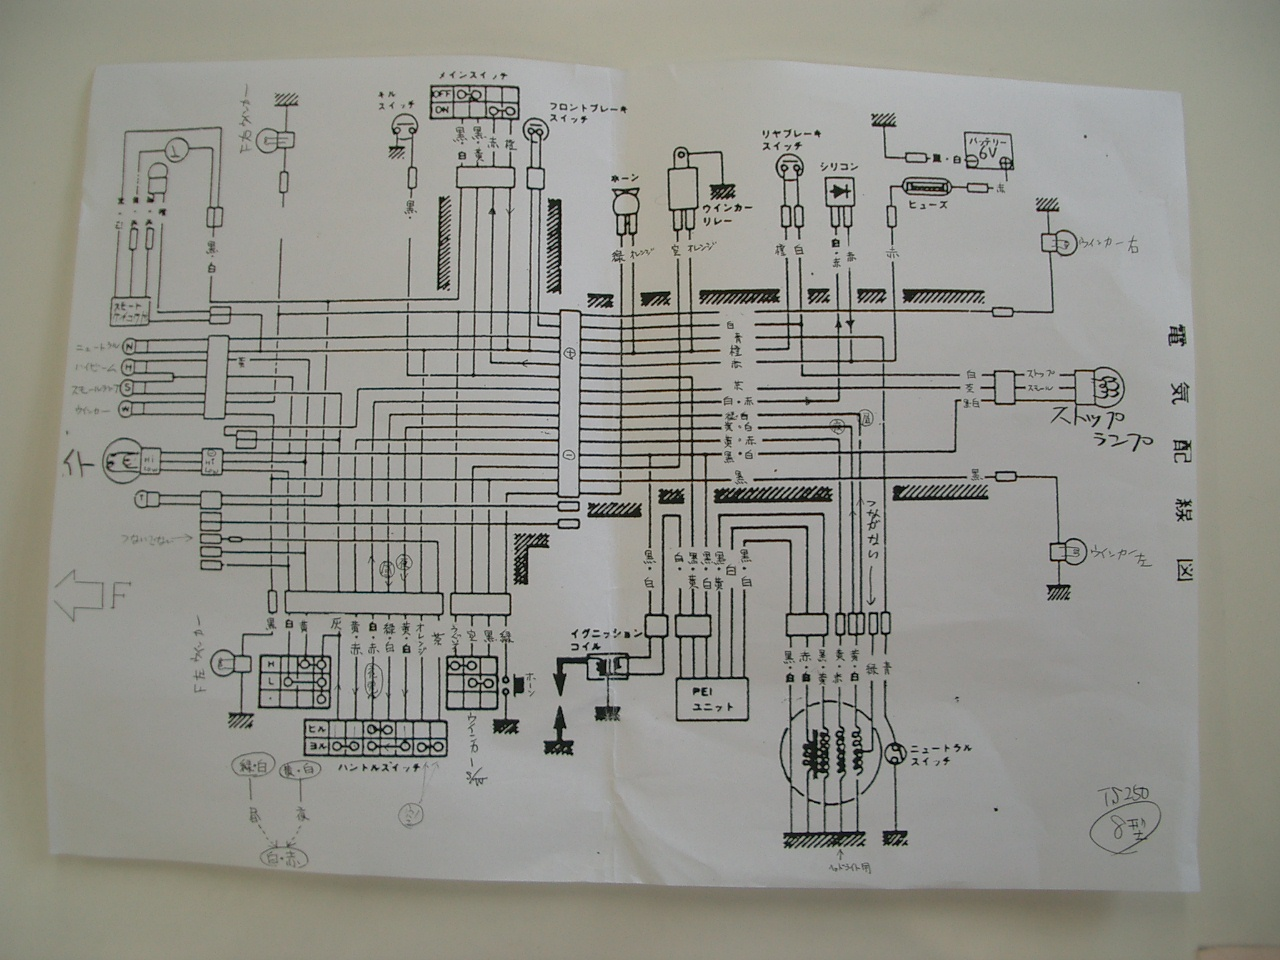 img9db3e57ezik1zj Xtrons Wiring Diagram on